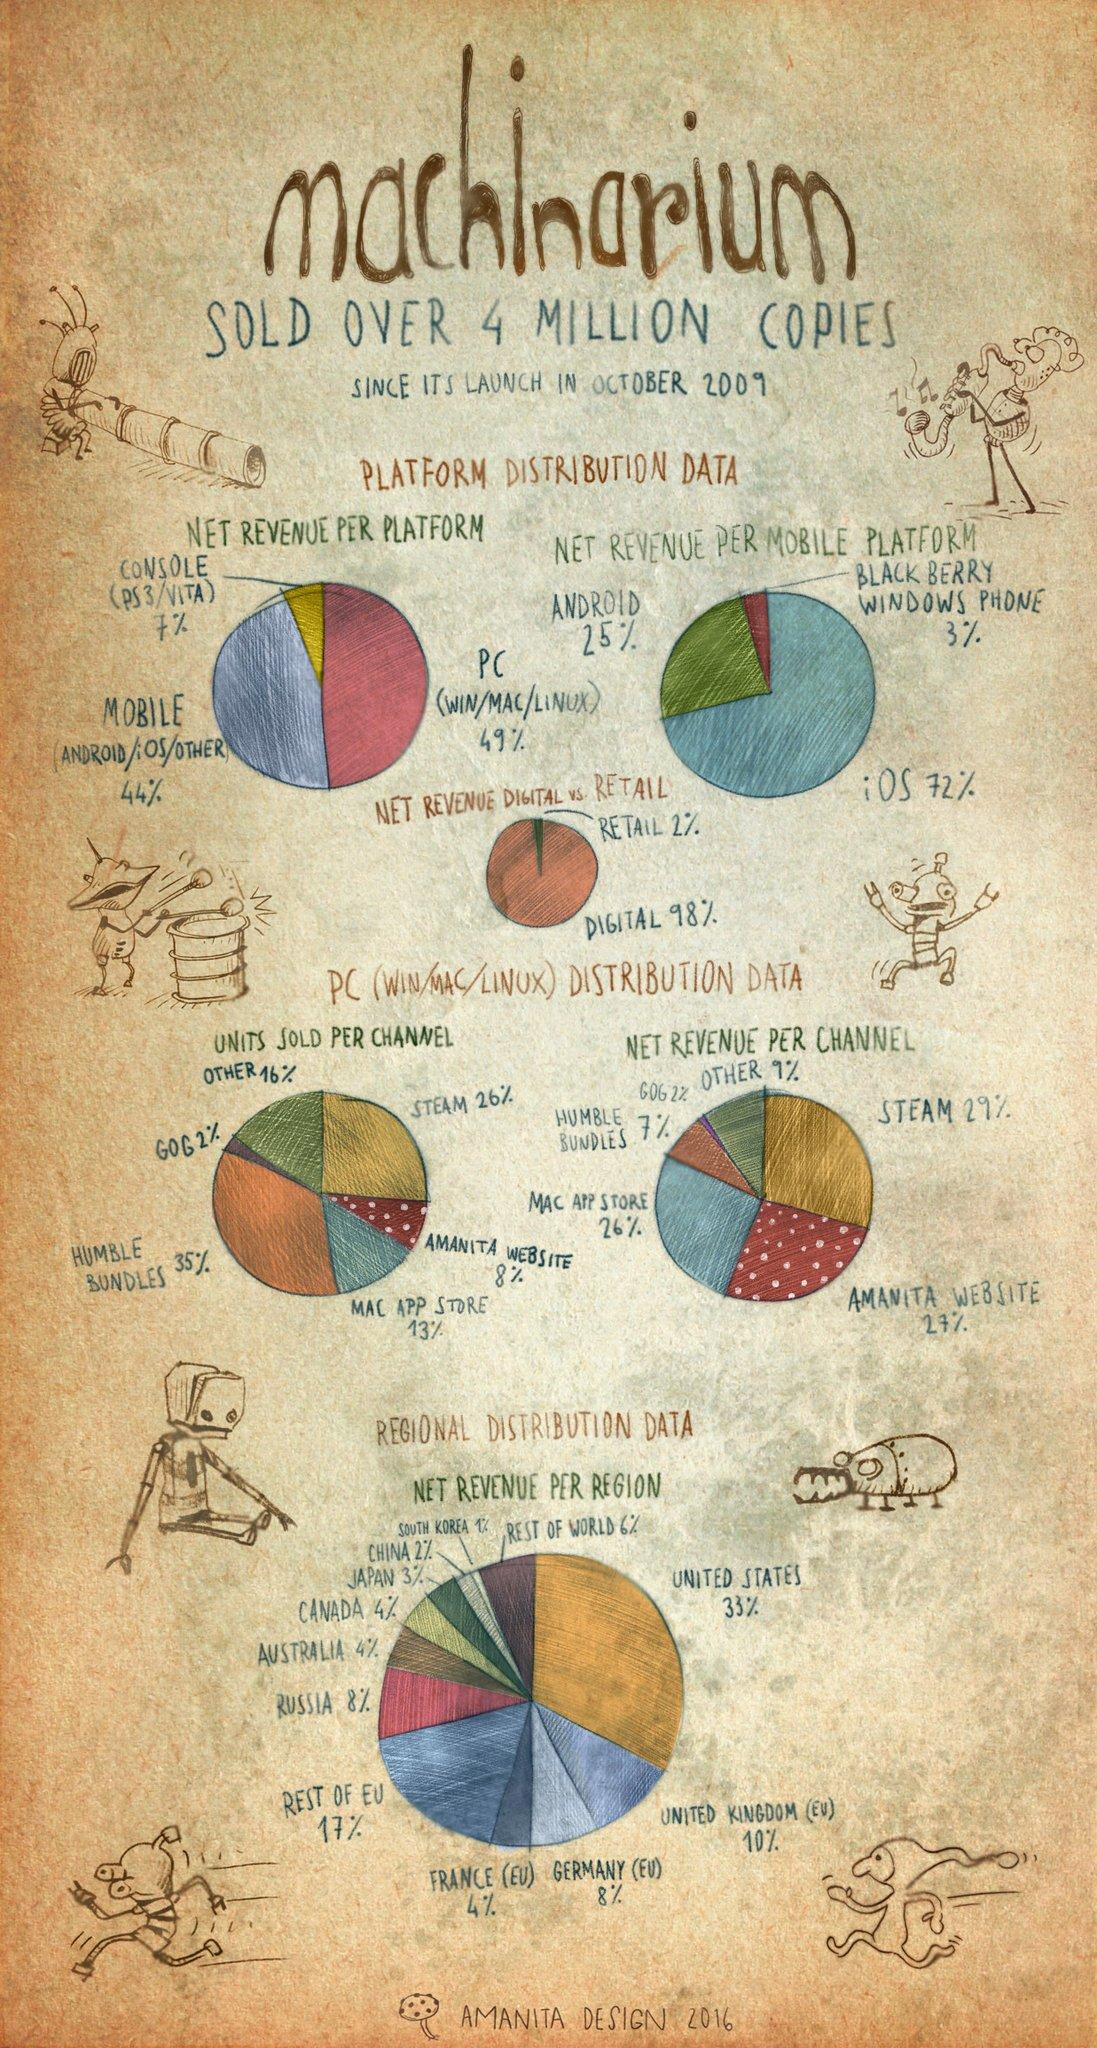 machinarium infografica 4 milioni di copie vendute